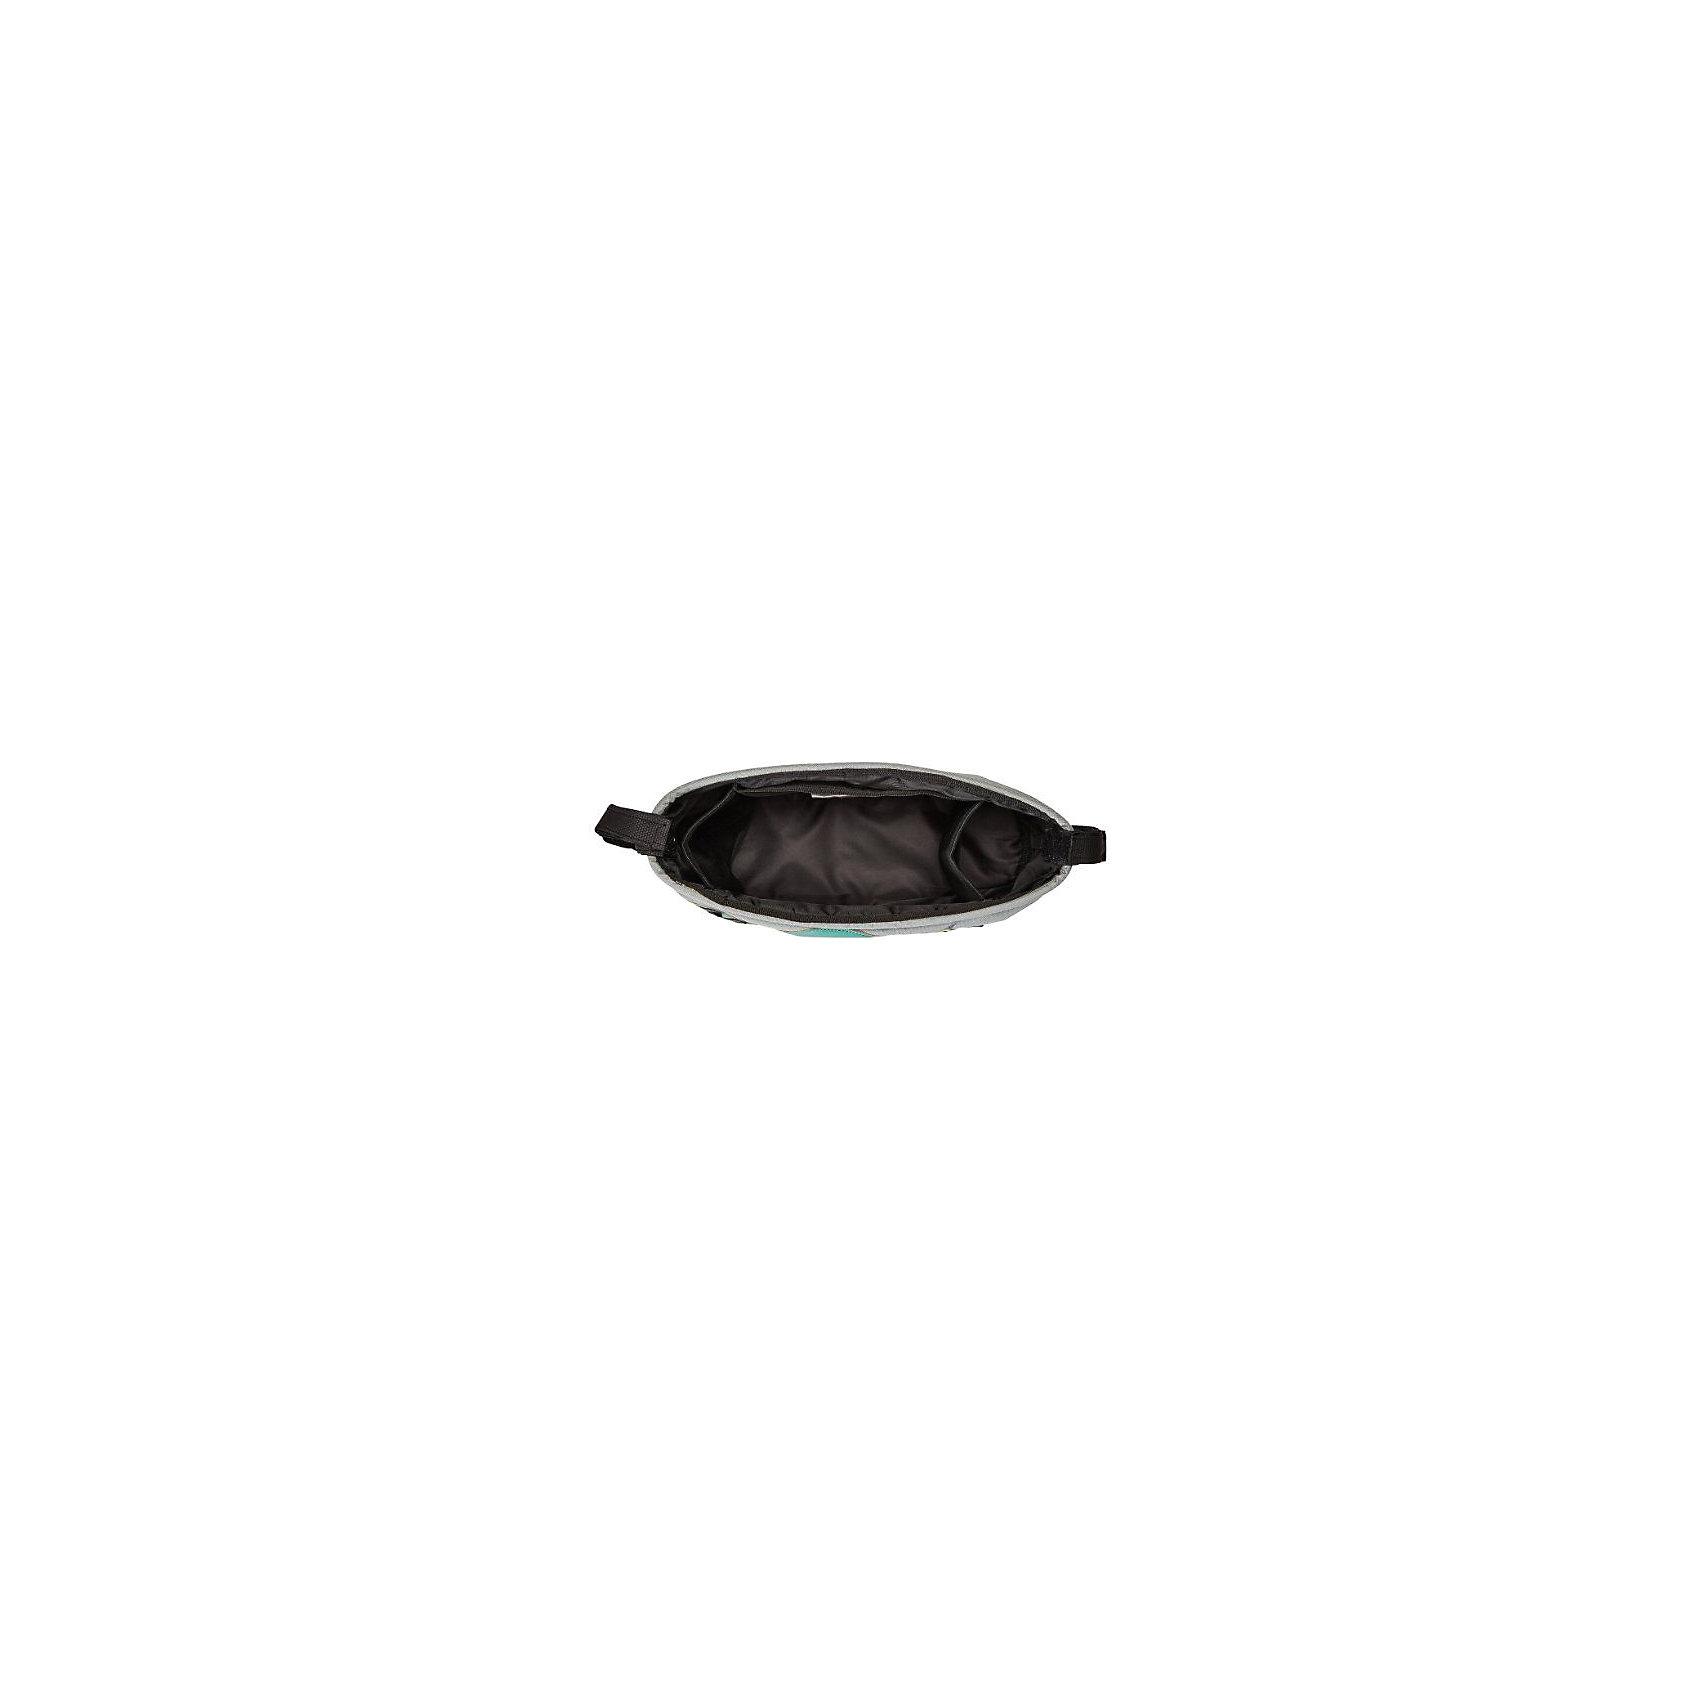 Сумка-органайзер для коляски Енот (Teal Raccoon), 3 Sprouts